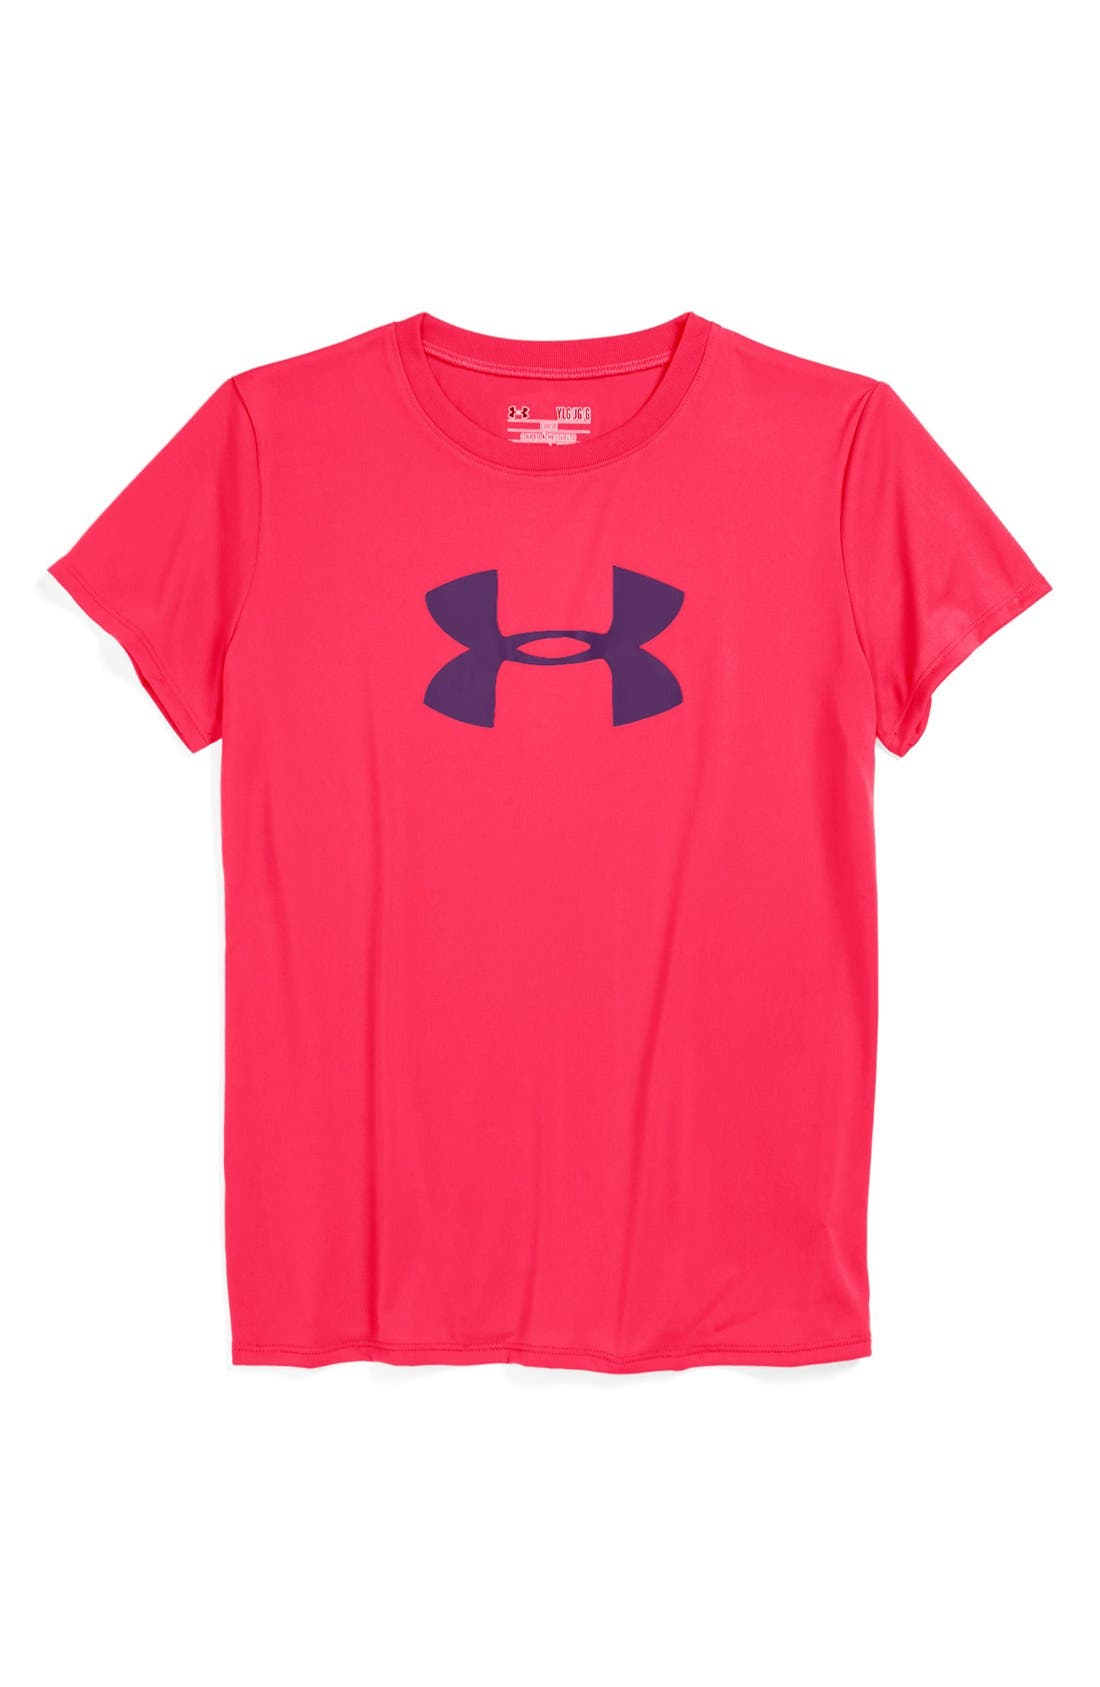 Alternate Image 1 Selected - Under Armour Logo HeatGear® Tee (Big Girls)